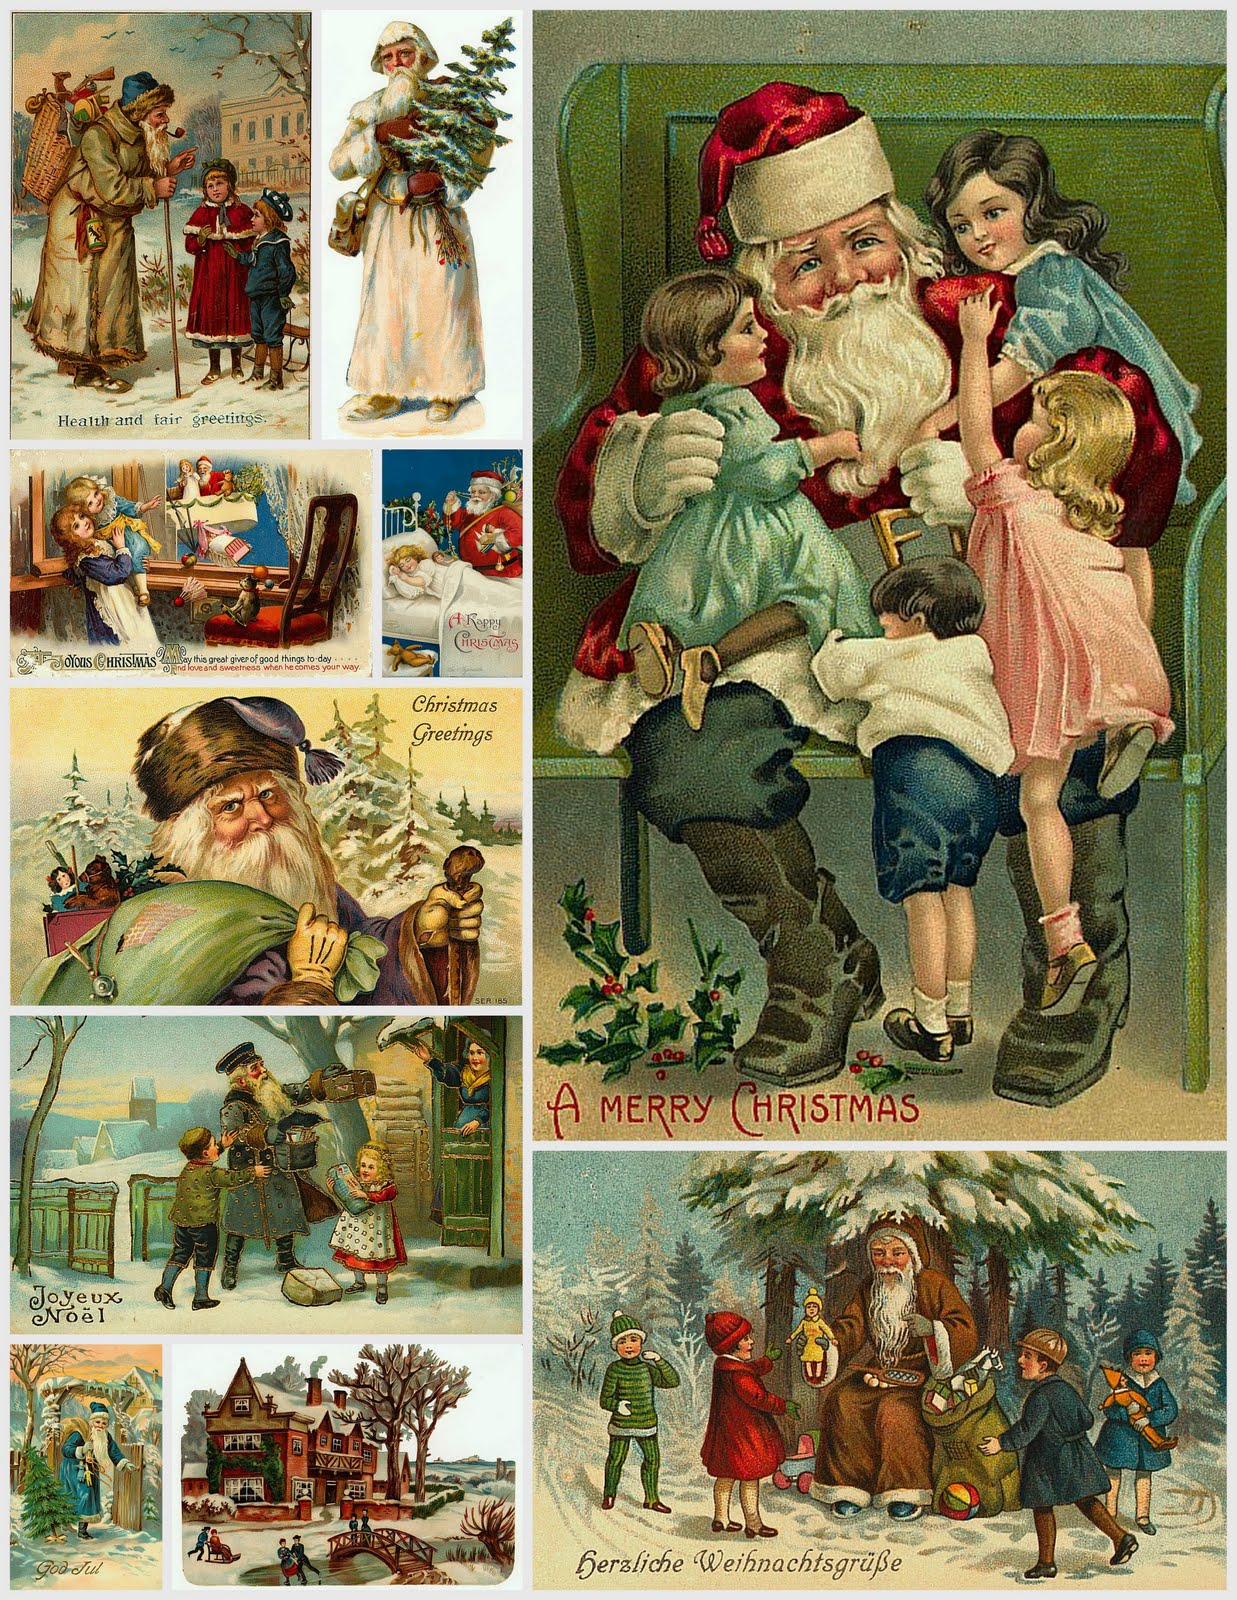 #6F391E Magic Moonlight Free Images: Christmas Collages For You! 5535 décorations de noel vintage 1237x1600 px @ aertt.com